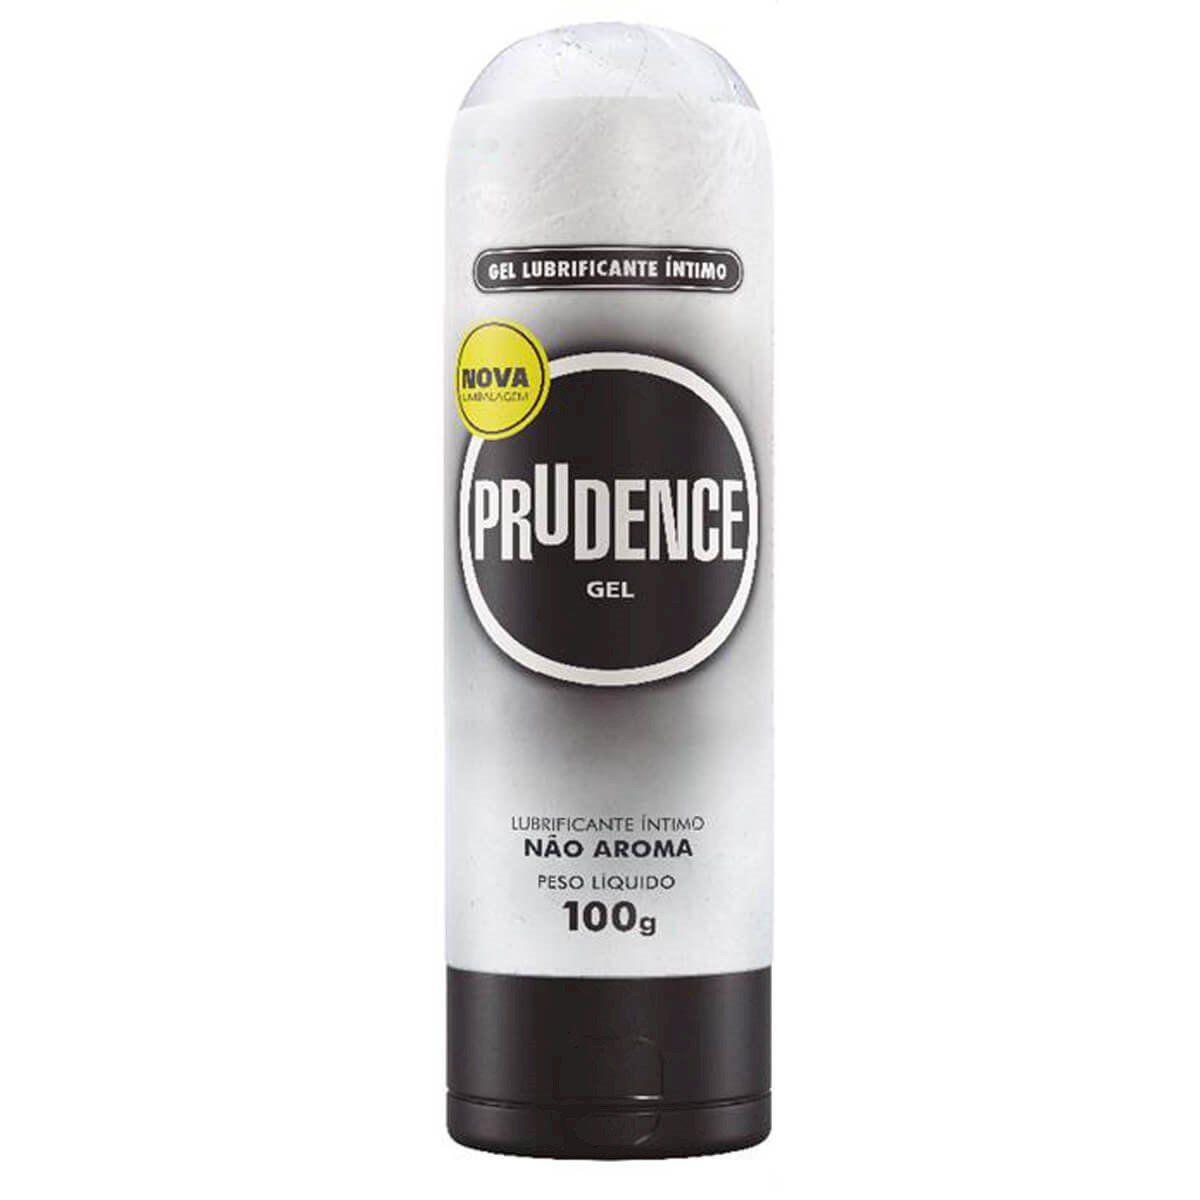 Gel Lubrificante Íntimo Não Aroma 100g Prudence